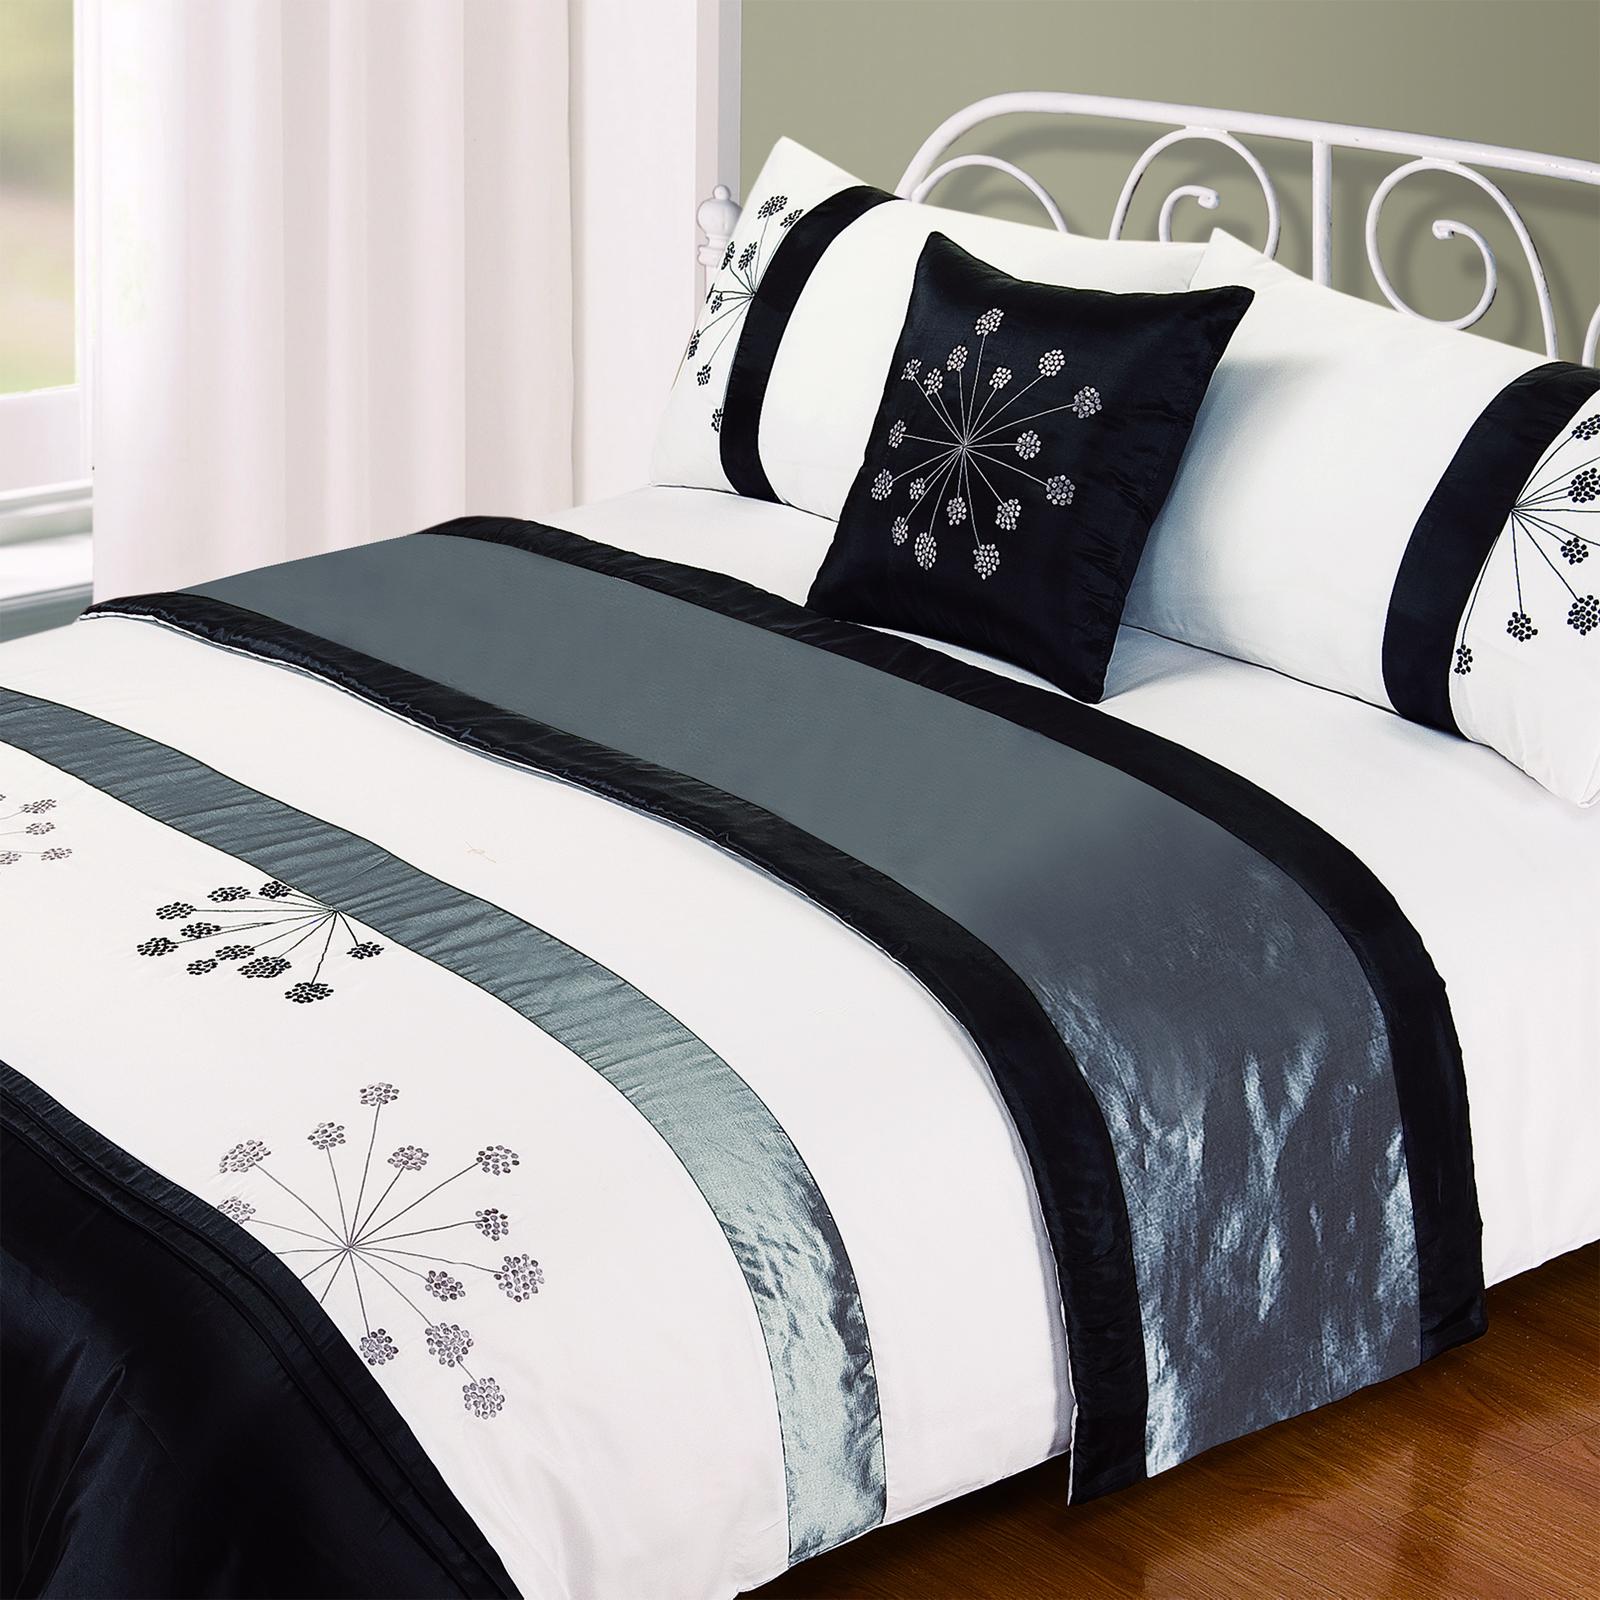 5 piezas juego de edred n bordado funda faux satin seda completo ropa cama ebay - Edredon de seda ...